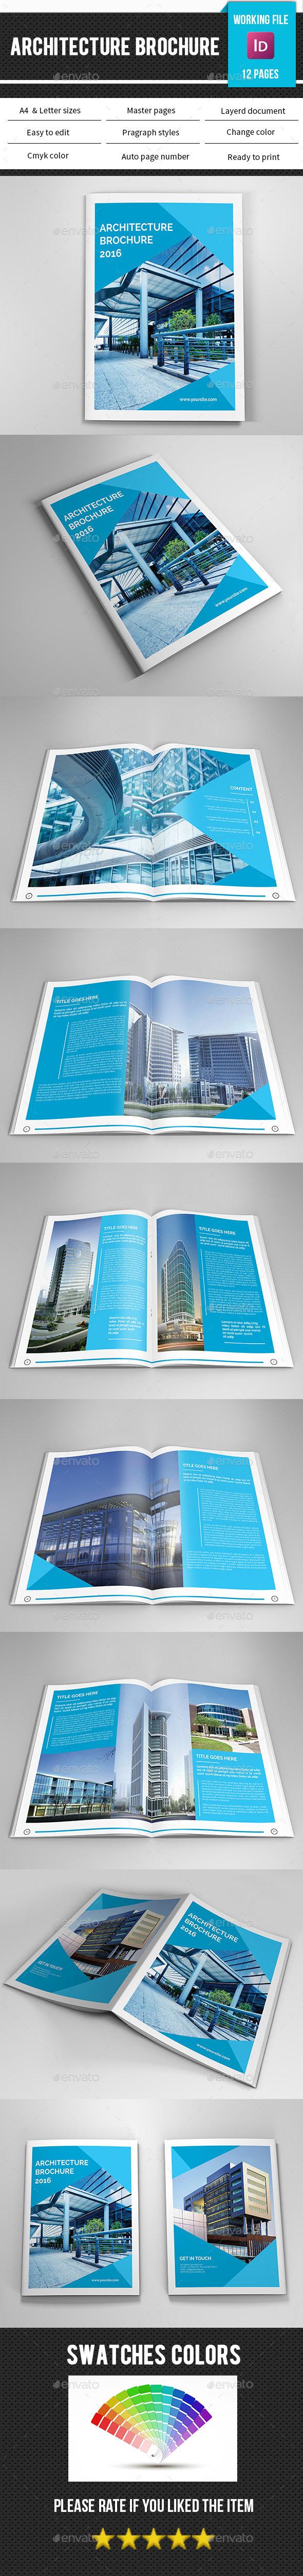 Corporate Brochure Template-V330 - Corporate Brochures